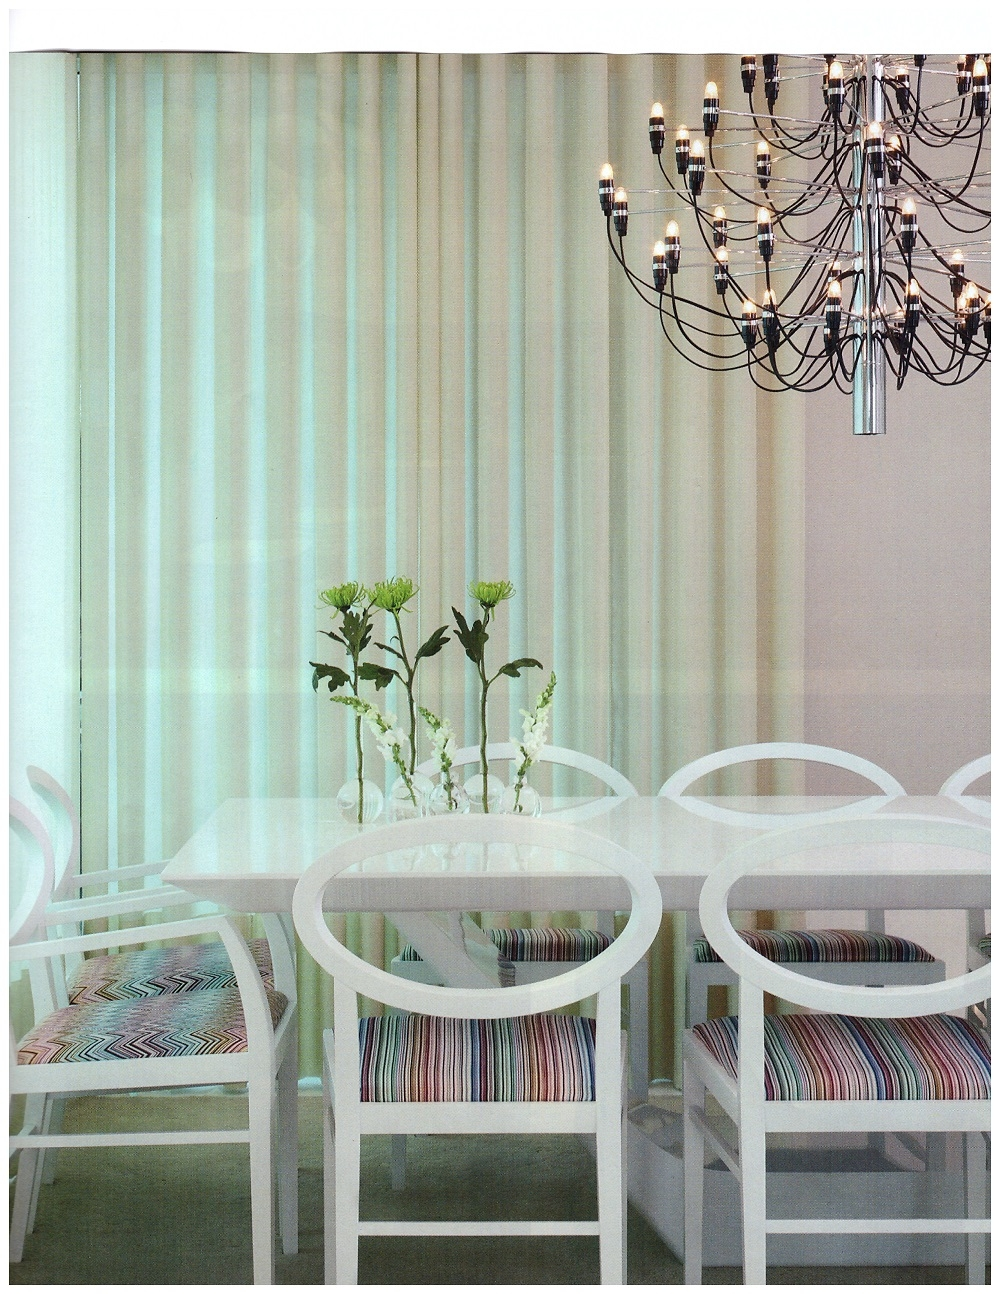 casa-projetoestilo-n36-vivian-coser-8-20160226121223.jpg